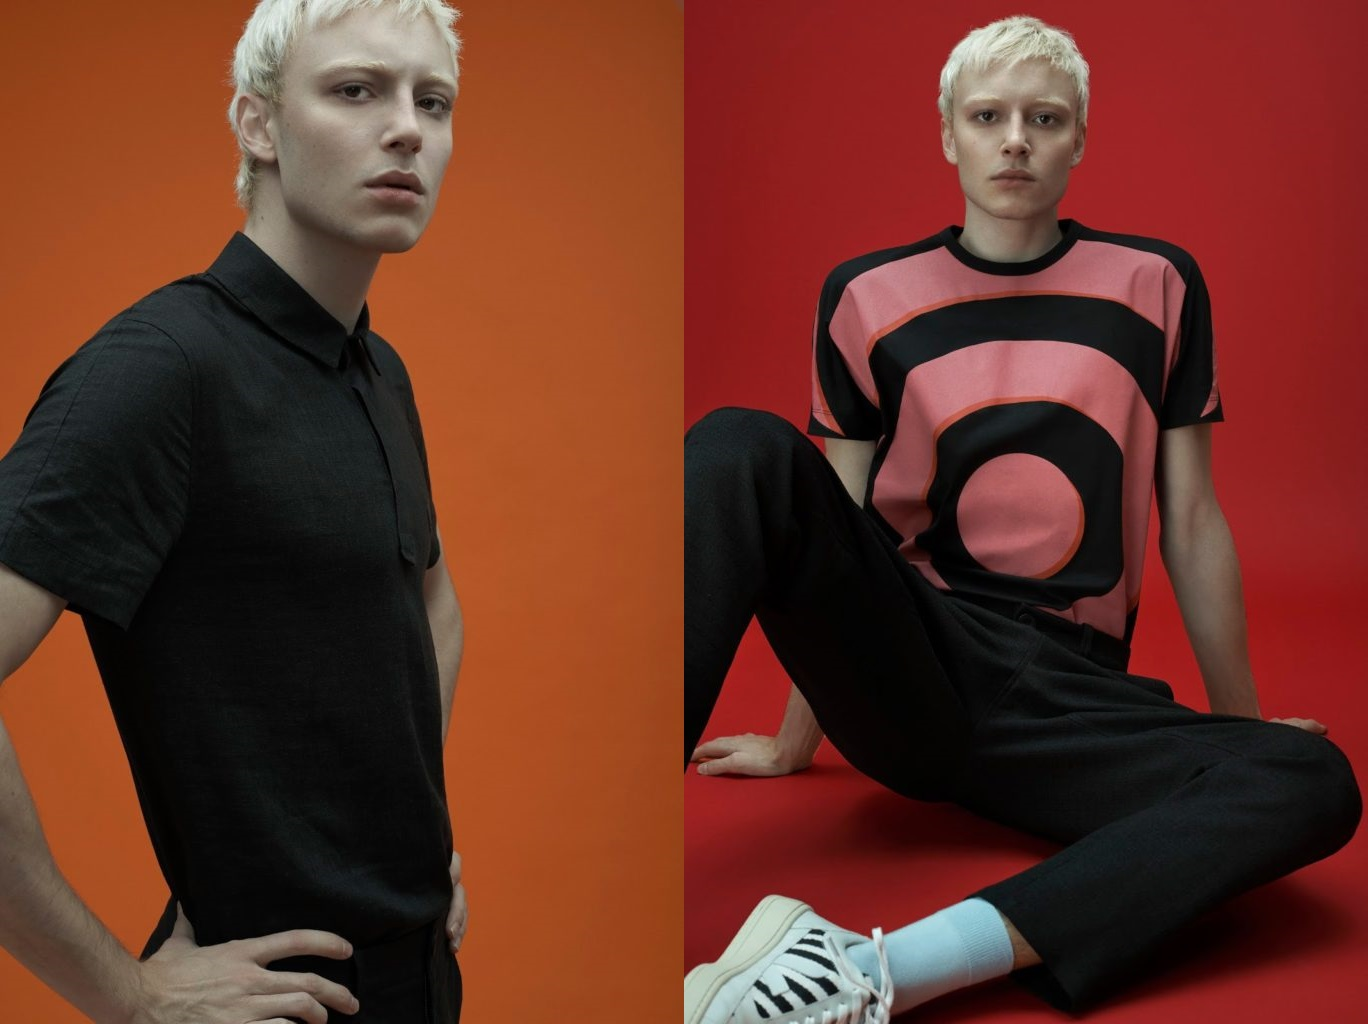 spfwn43, modelo, joao zanella, ford, ford models, ford brasil, male model, moda sem censura, blog de moda masculina